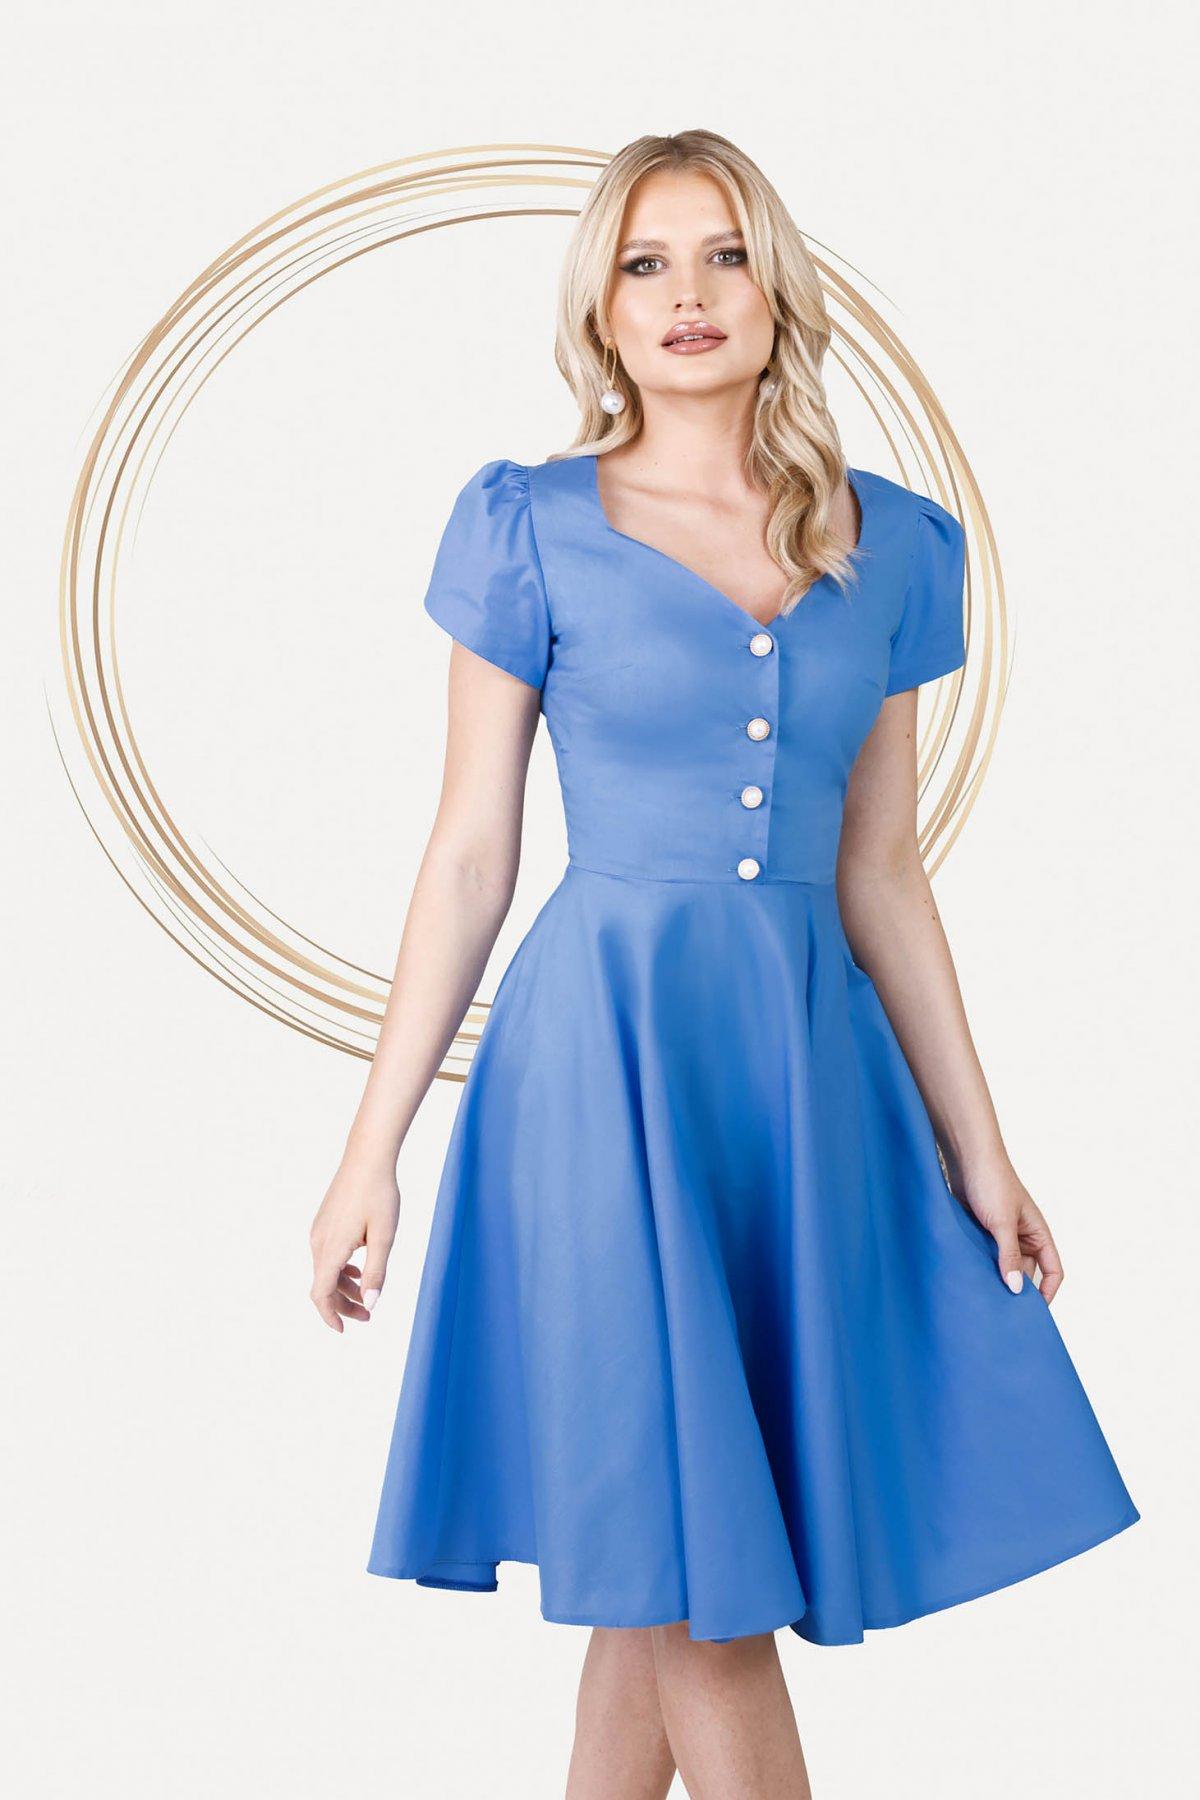 Rochie PrettyGirl albastra office midi in clos din poplin usor elastic cu decolteu inima